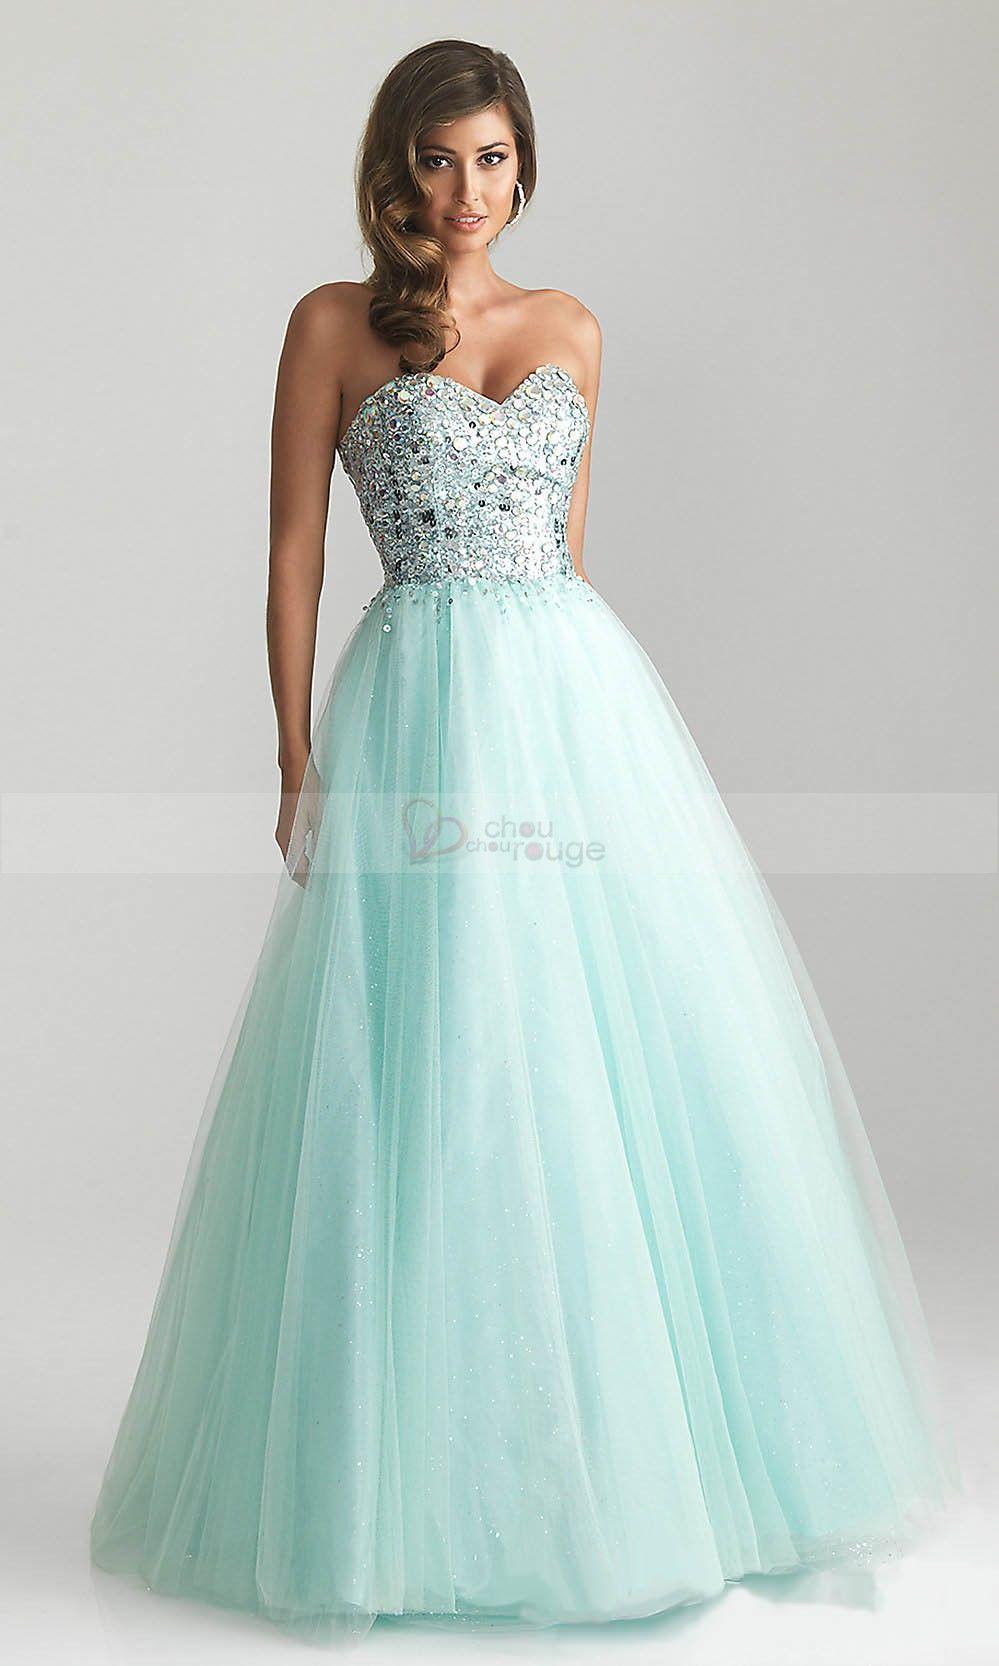 Cute Teal Prom Dresses